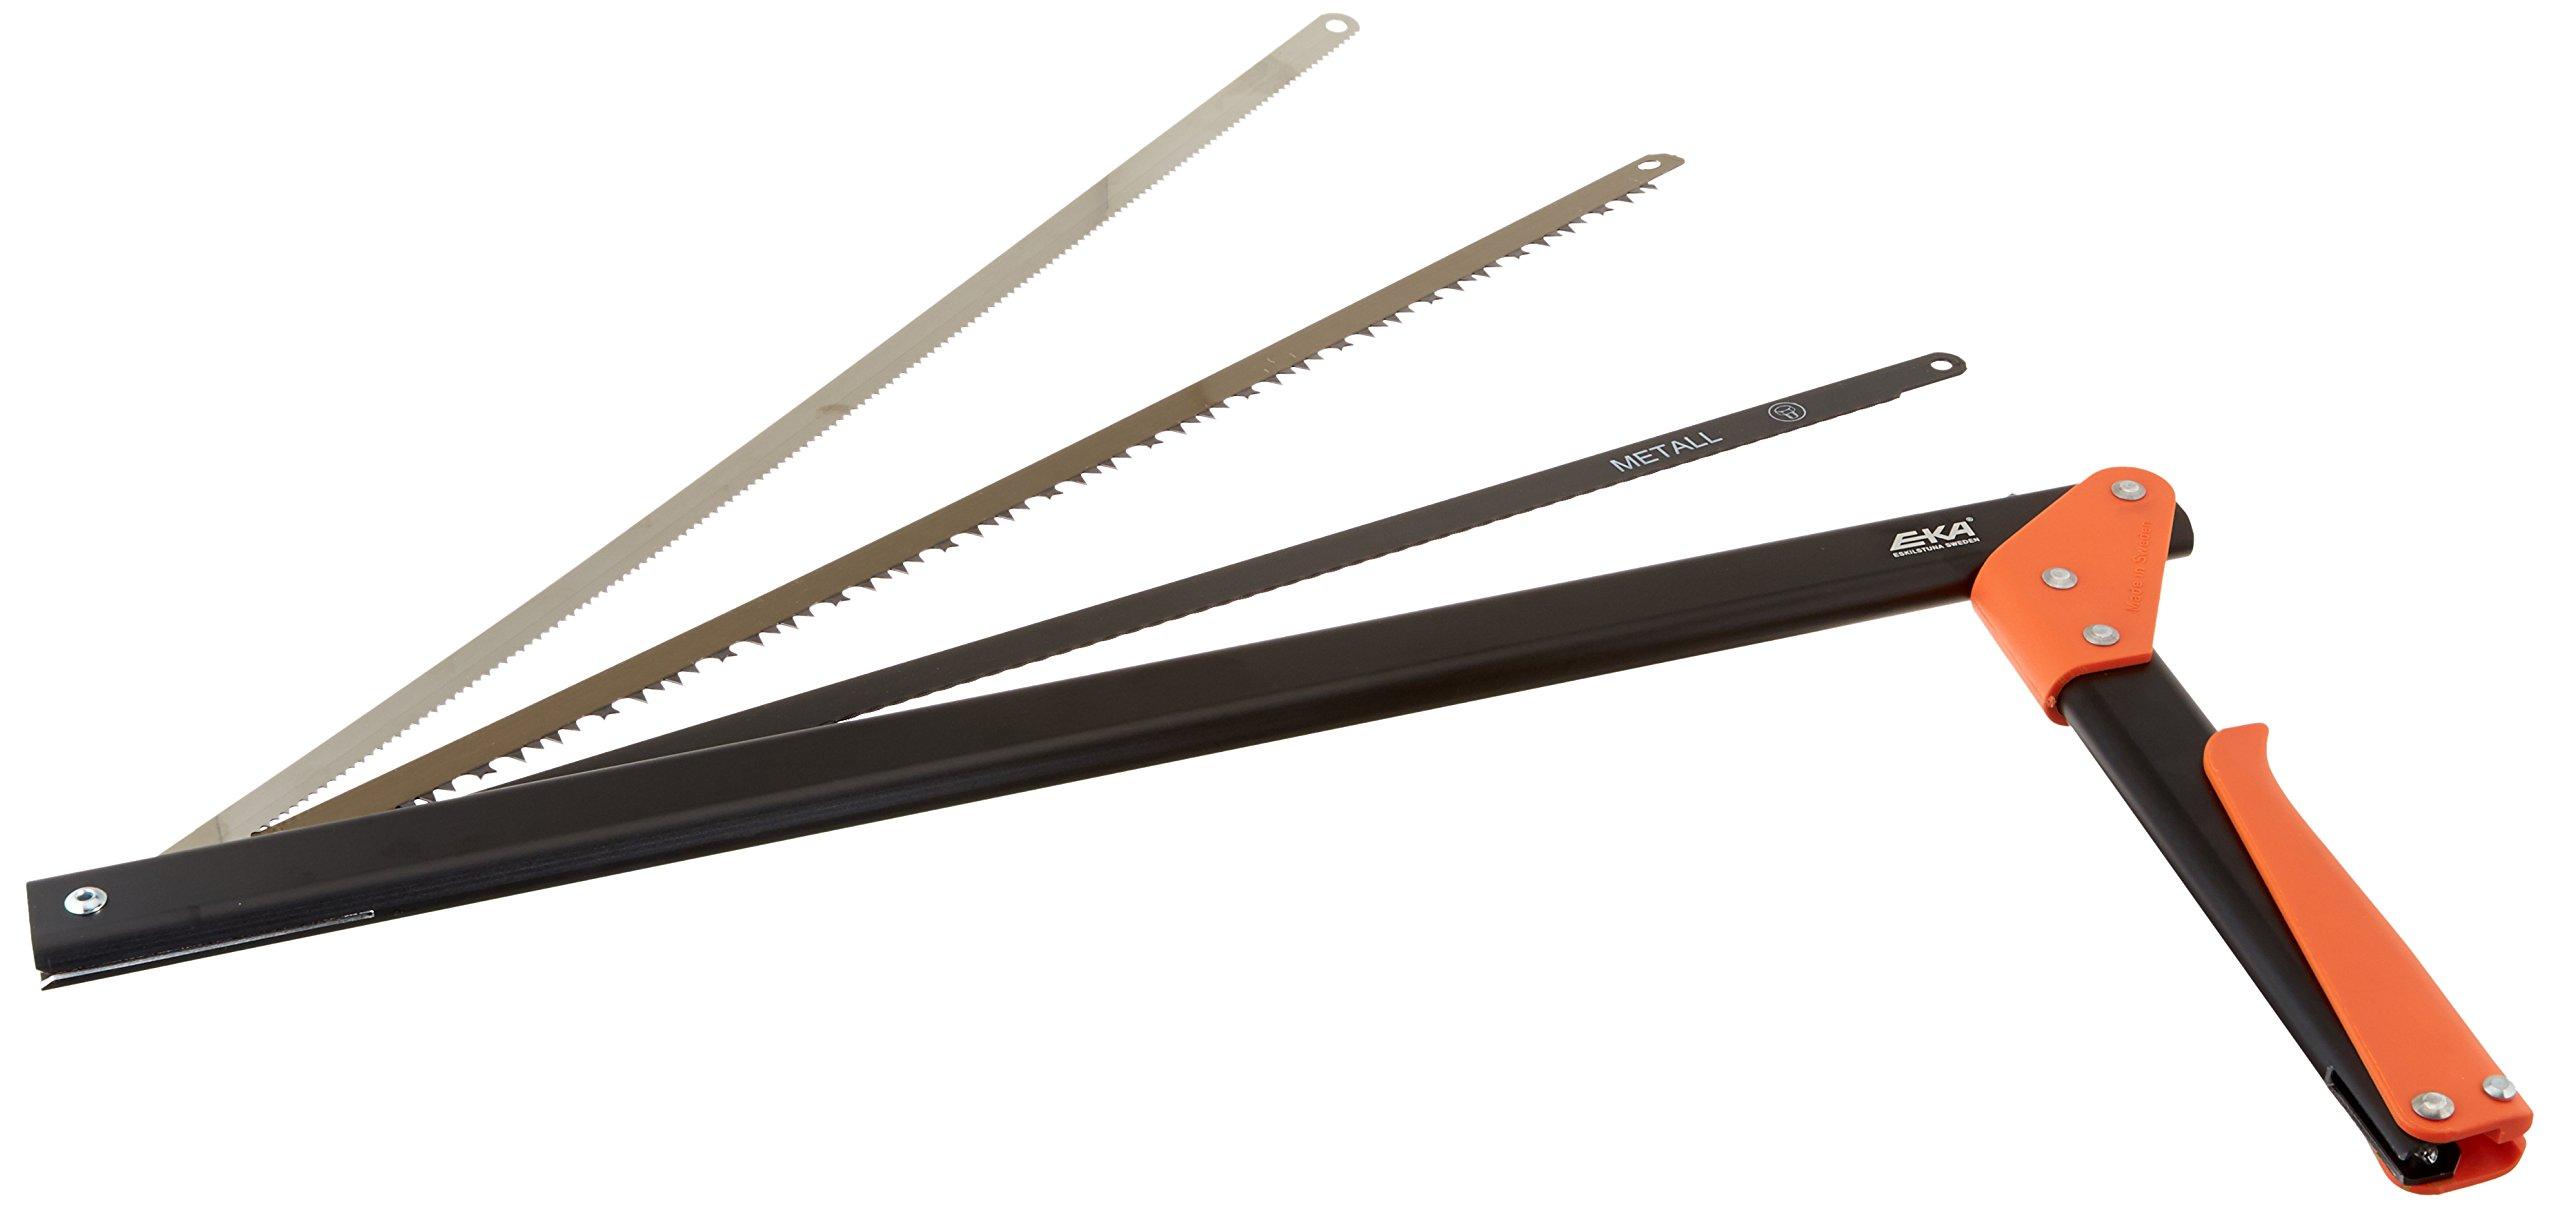 EKA Viking Combi Compact Saw, 21-Inch, Black with Orange Handle by EKA (Image #2)